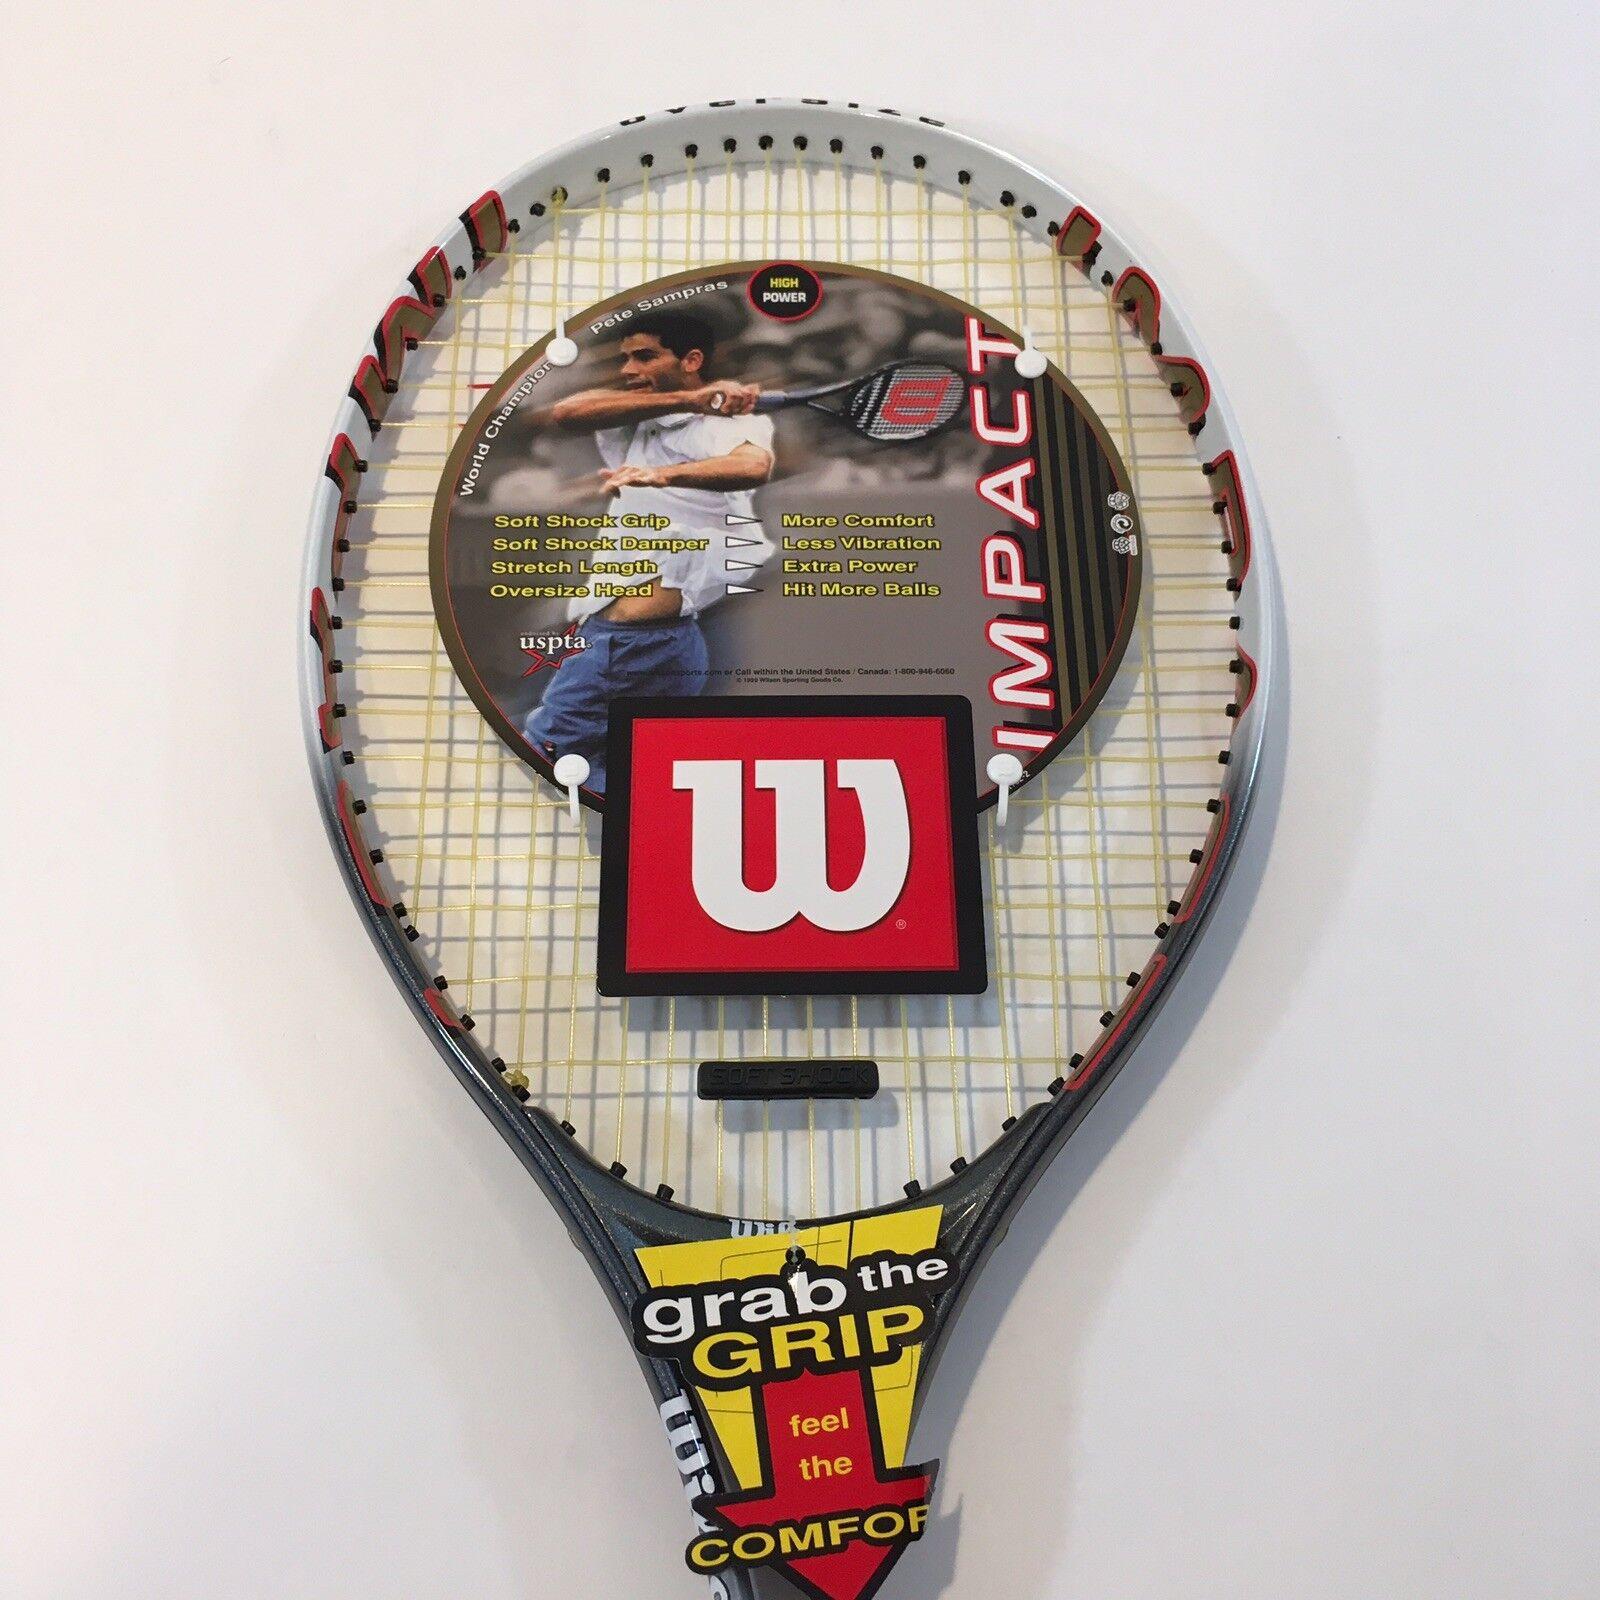 Wilson 110 Stretch Raquette de tennis 4 3 8 L3 OverTaille Impact Soft choc sampras